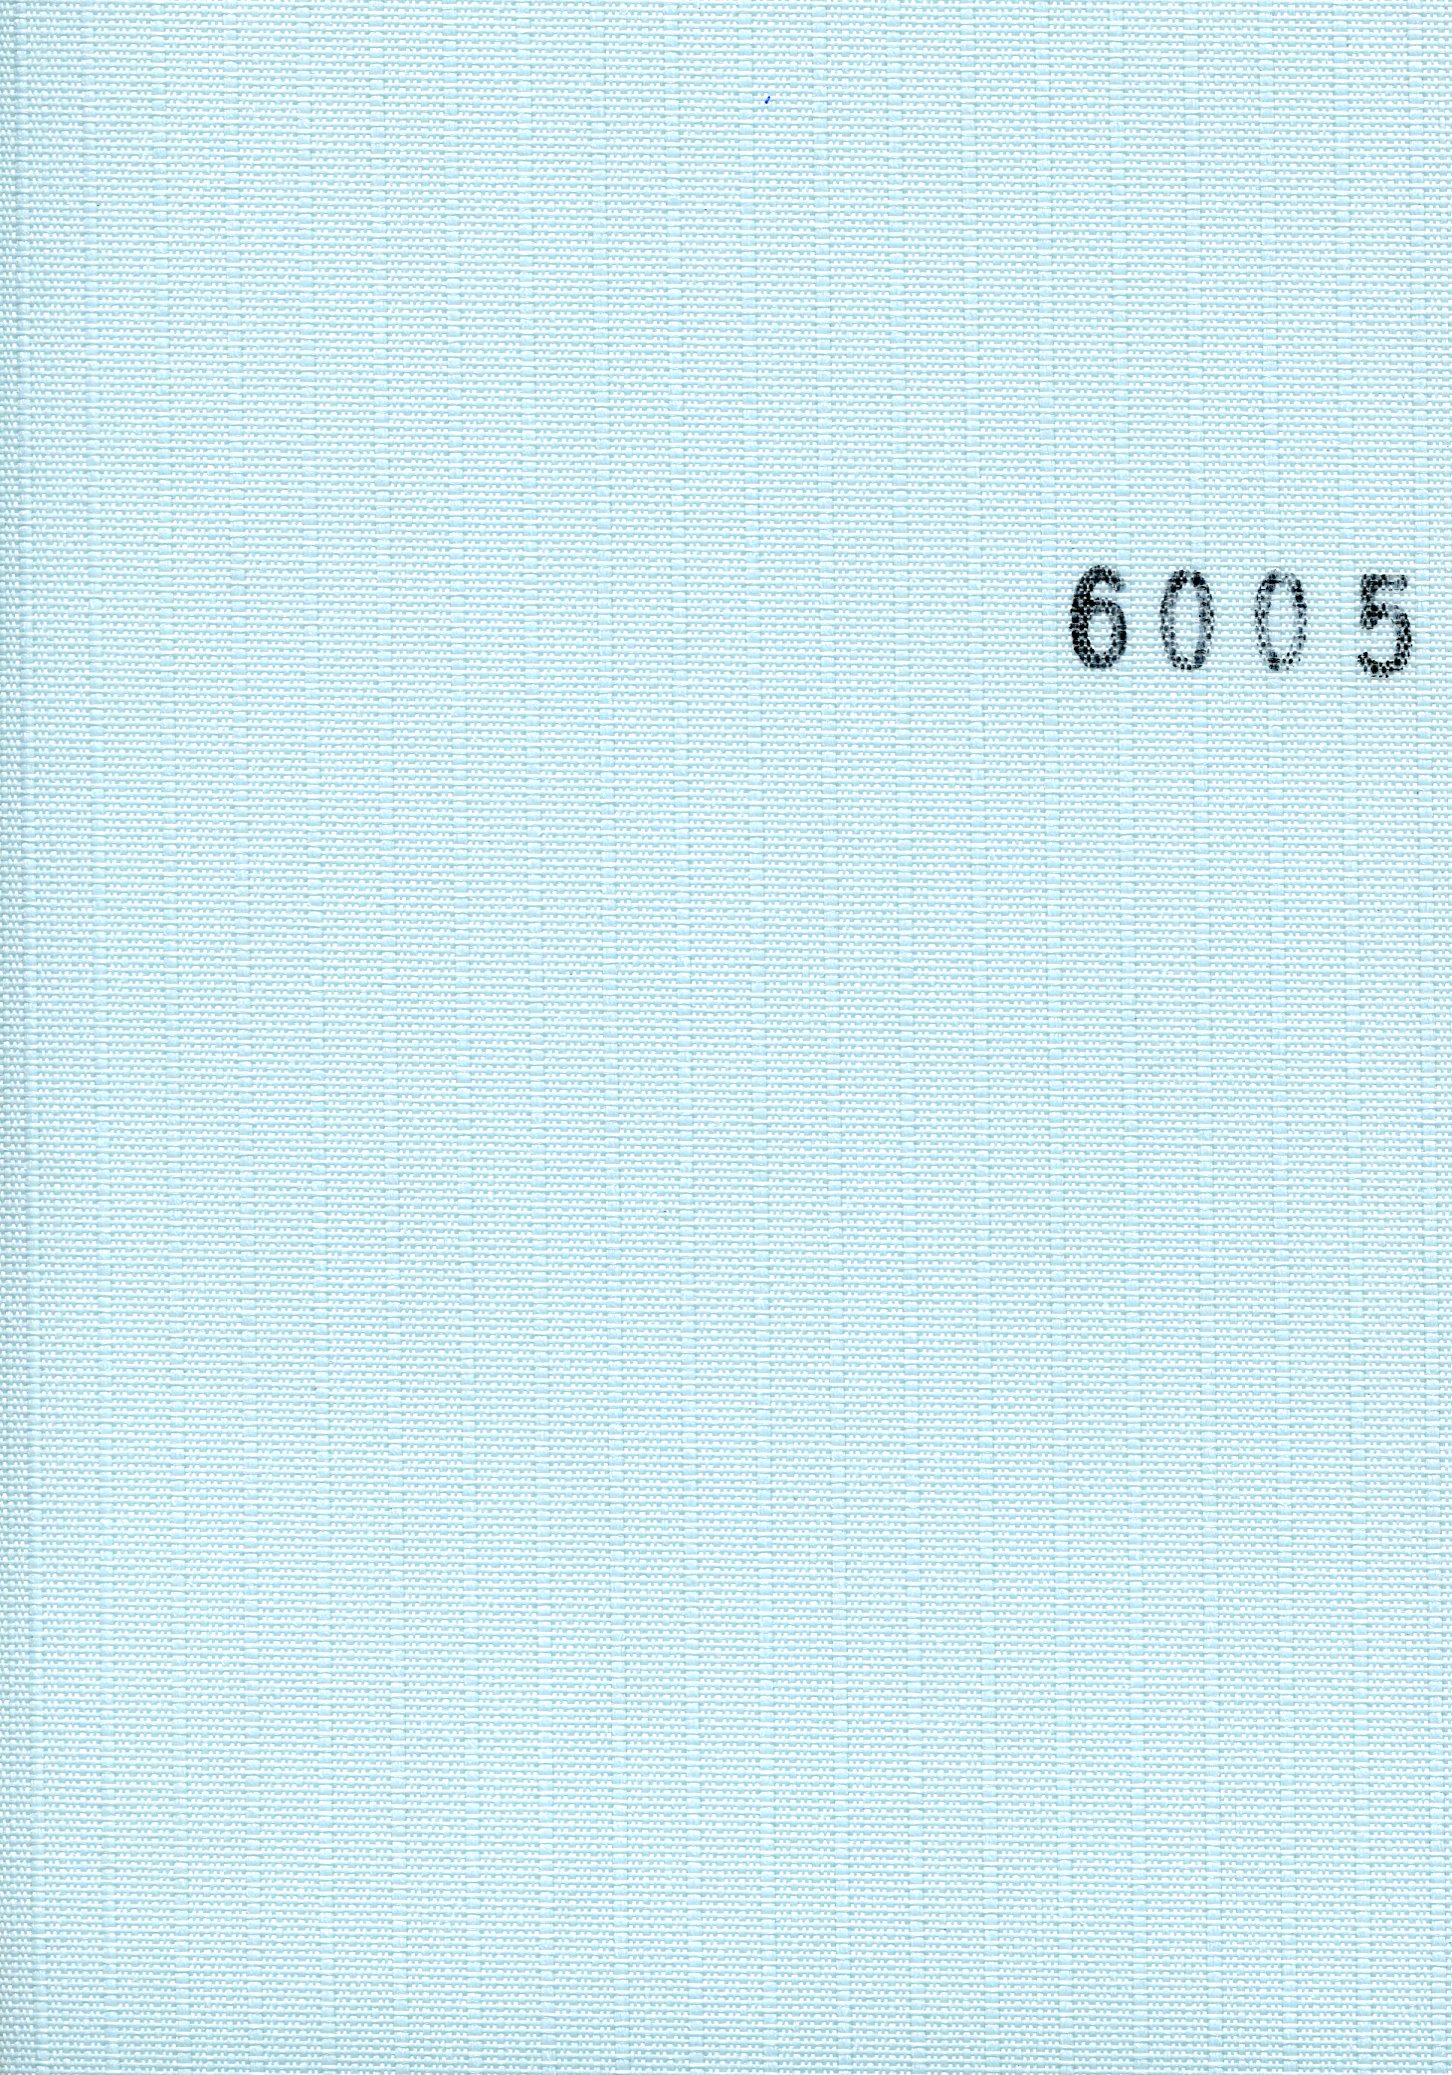 Line 6005